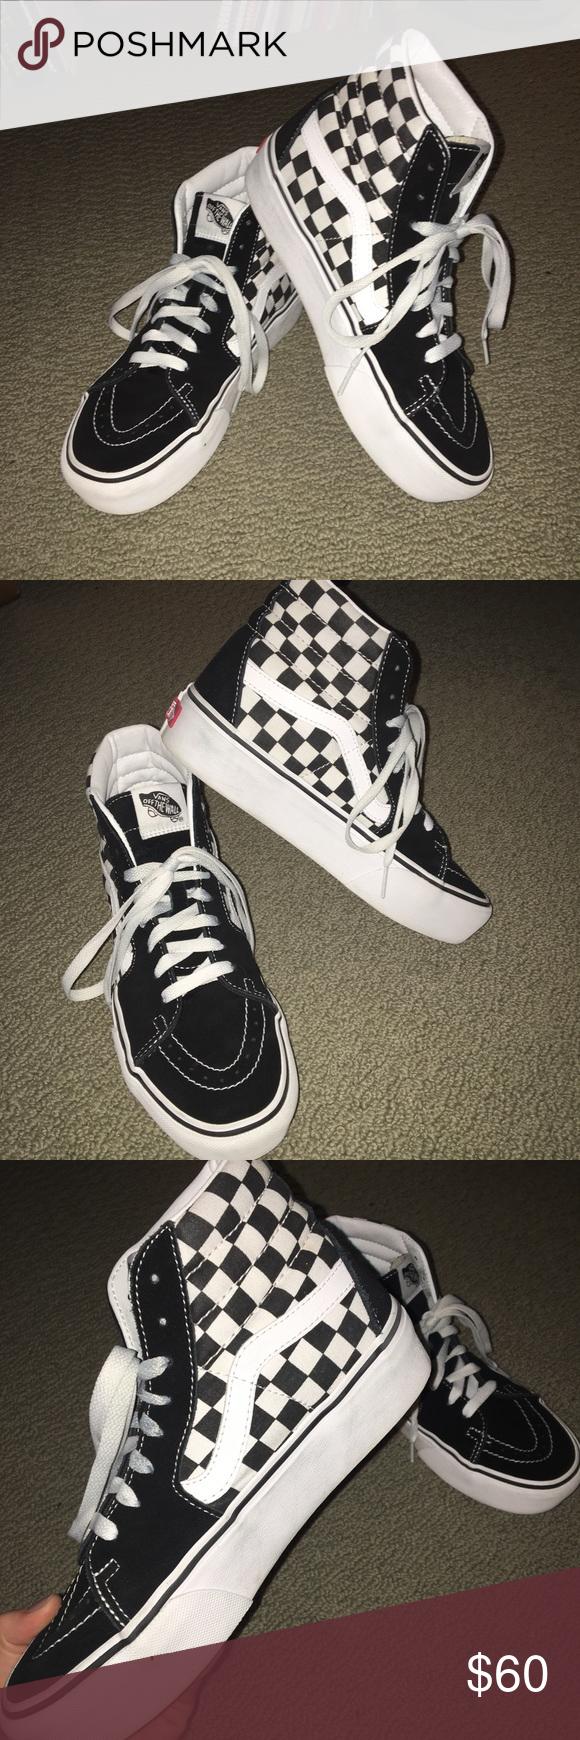 e20c083e3e6 Vans Shoes | Womens Sk8-Hi Platform Checkered True White Vans ...